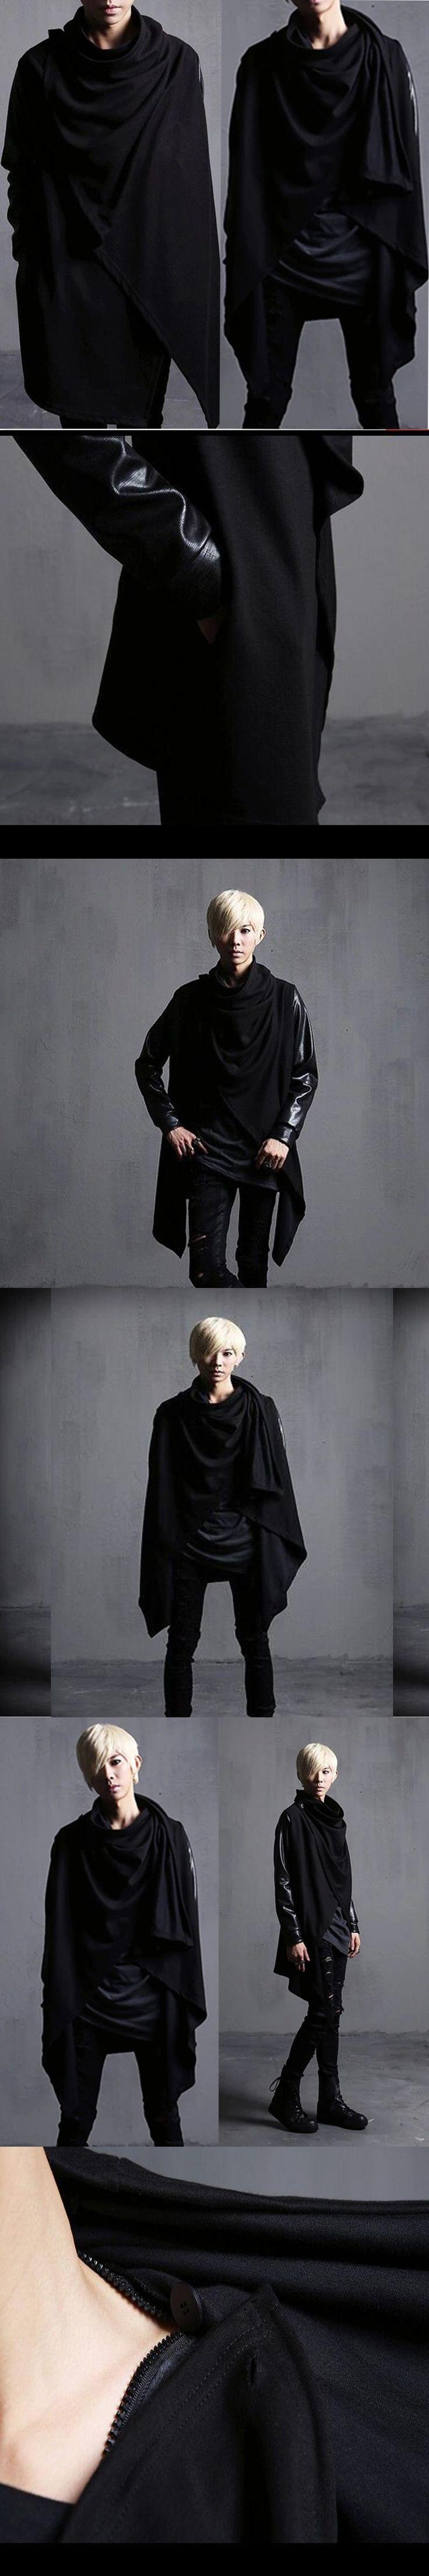 Avant-garde  Edgy Unbalance Mens Fashion Draping Shawl Faux Leather Cardigan Cloak Outwear Coat Mens Stylist Club Dance Tops